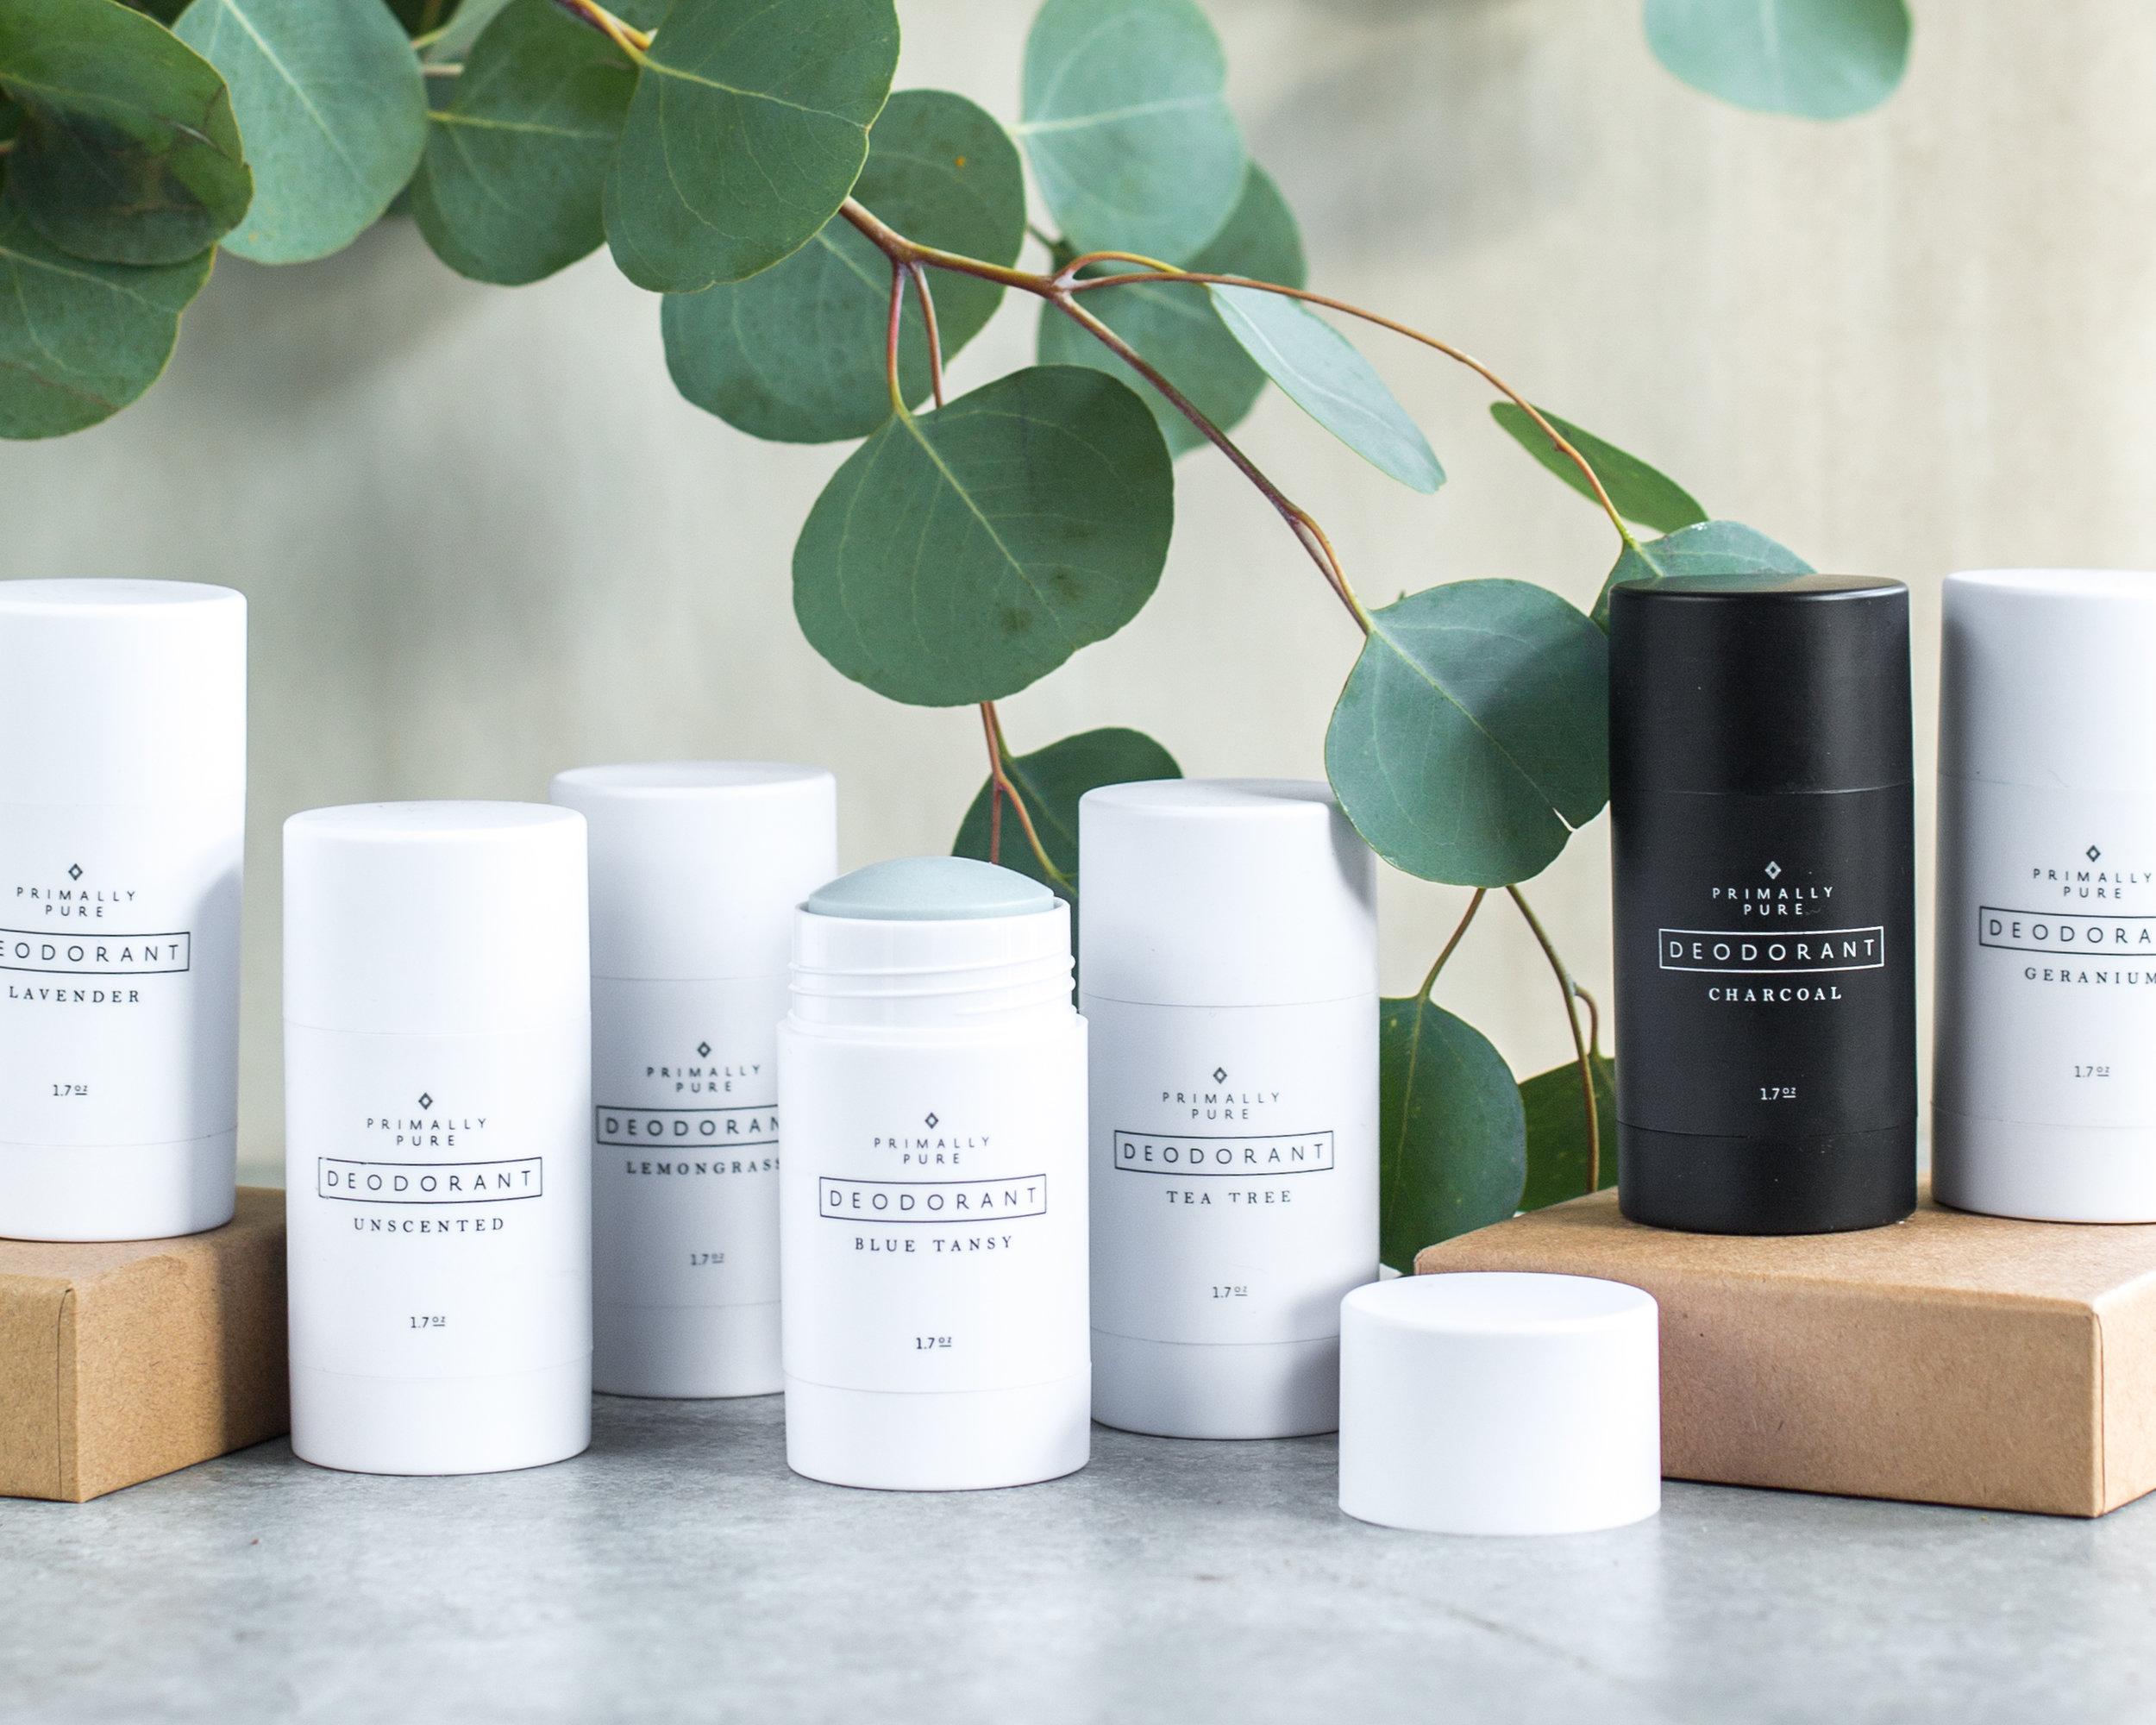 primally pure deodorant sale